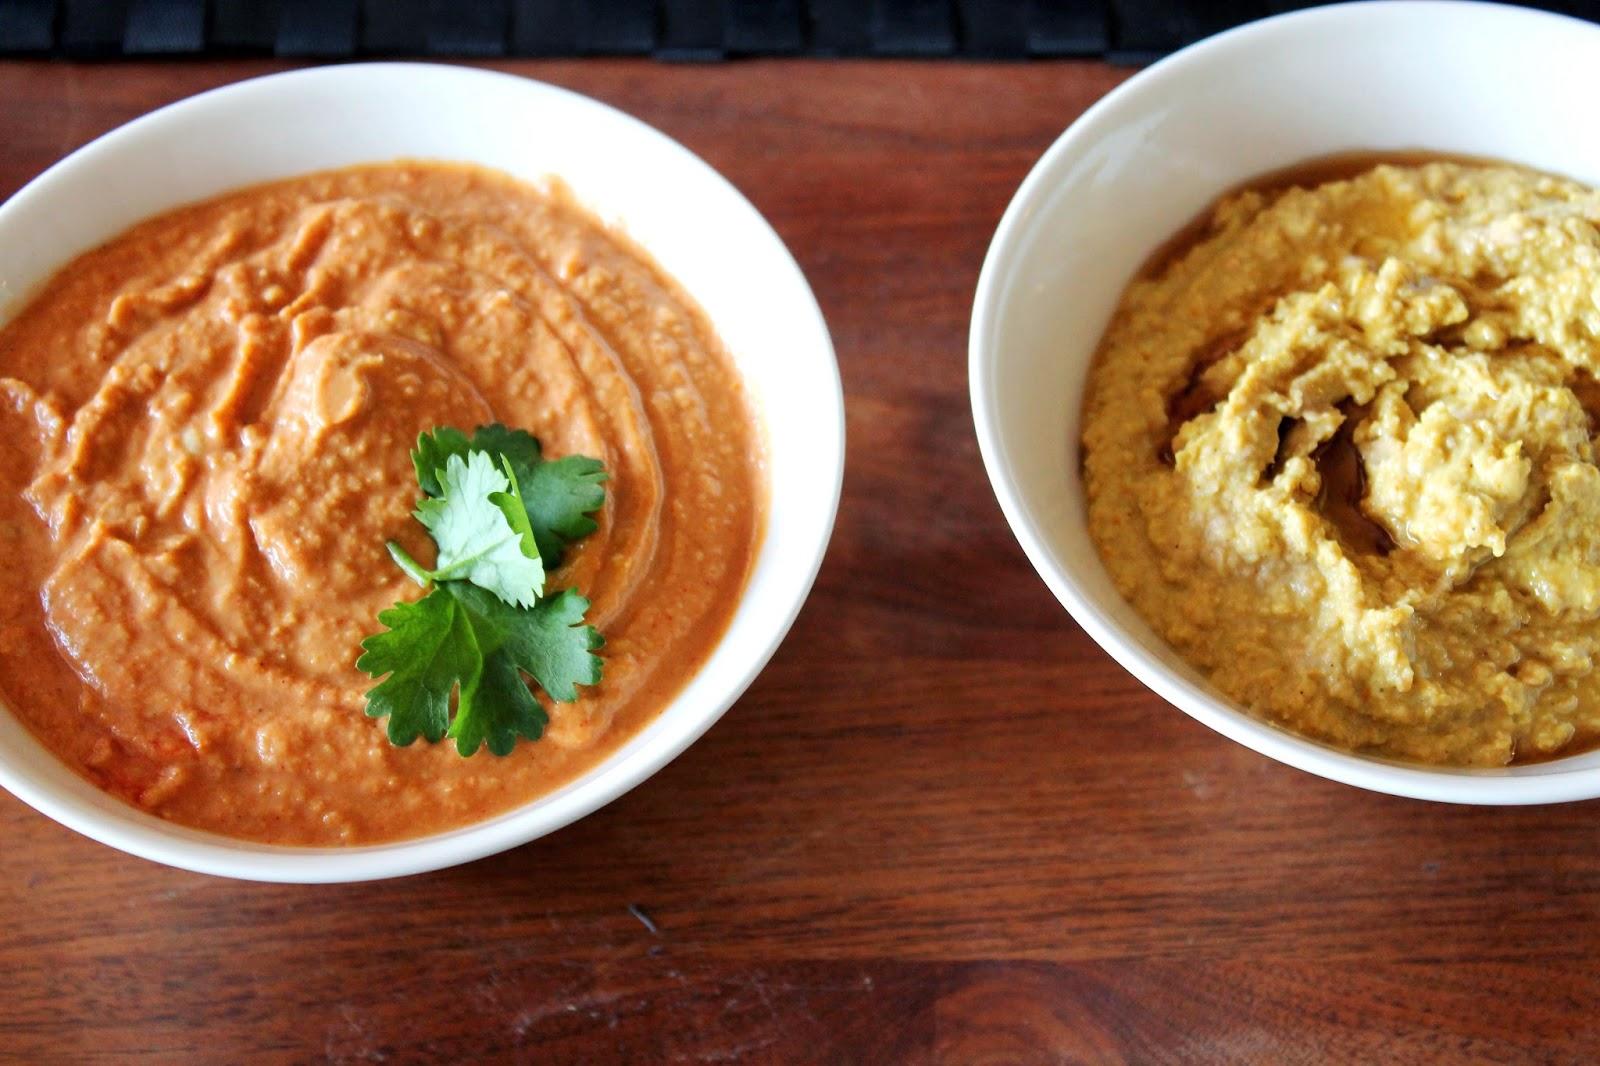 Hummus, original and chili-tomato | Alinan kotona blog